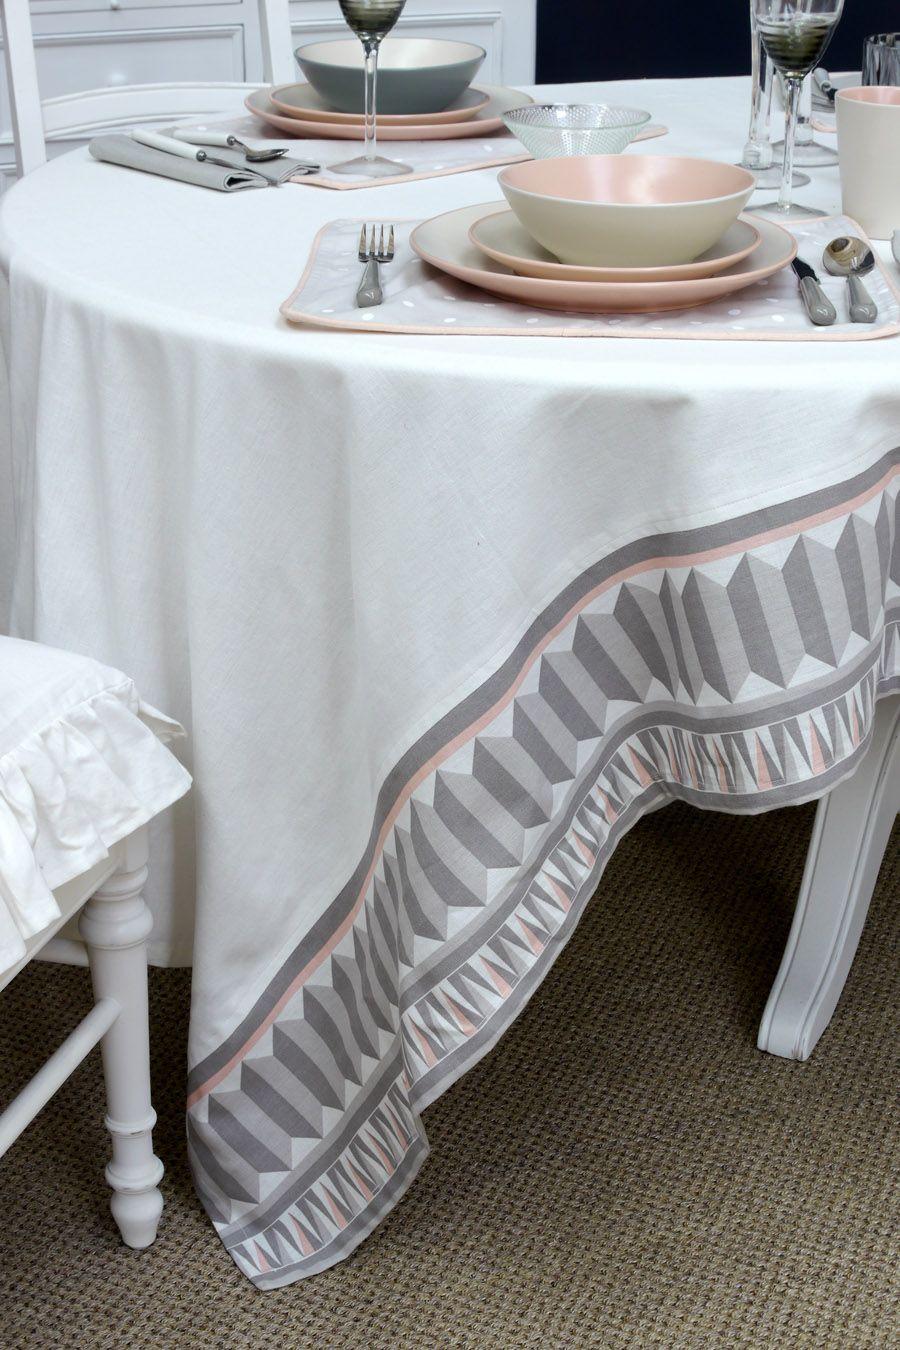 nappe en coton et lin 260x160 blanc interior 39 s. Black Bedroom Furniture Sets. Home Design Ideas